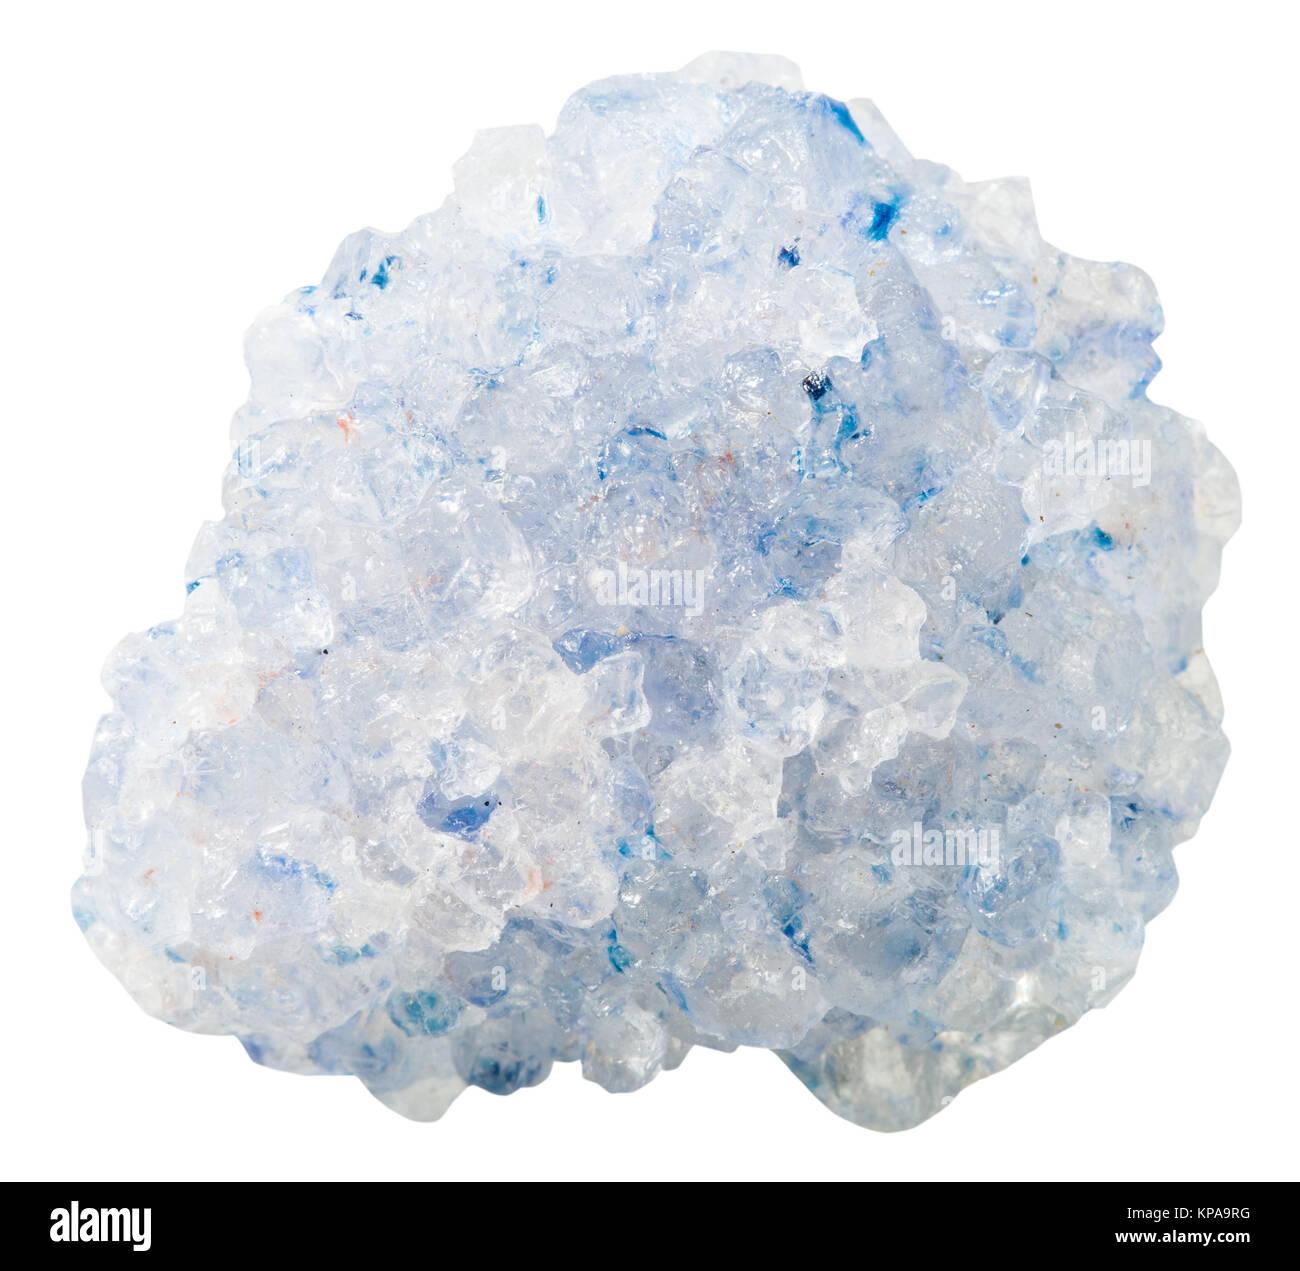 crystalline Celestine (celestite) mineral stone - Stock Image